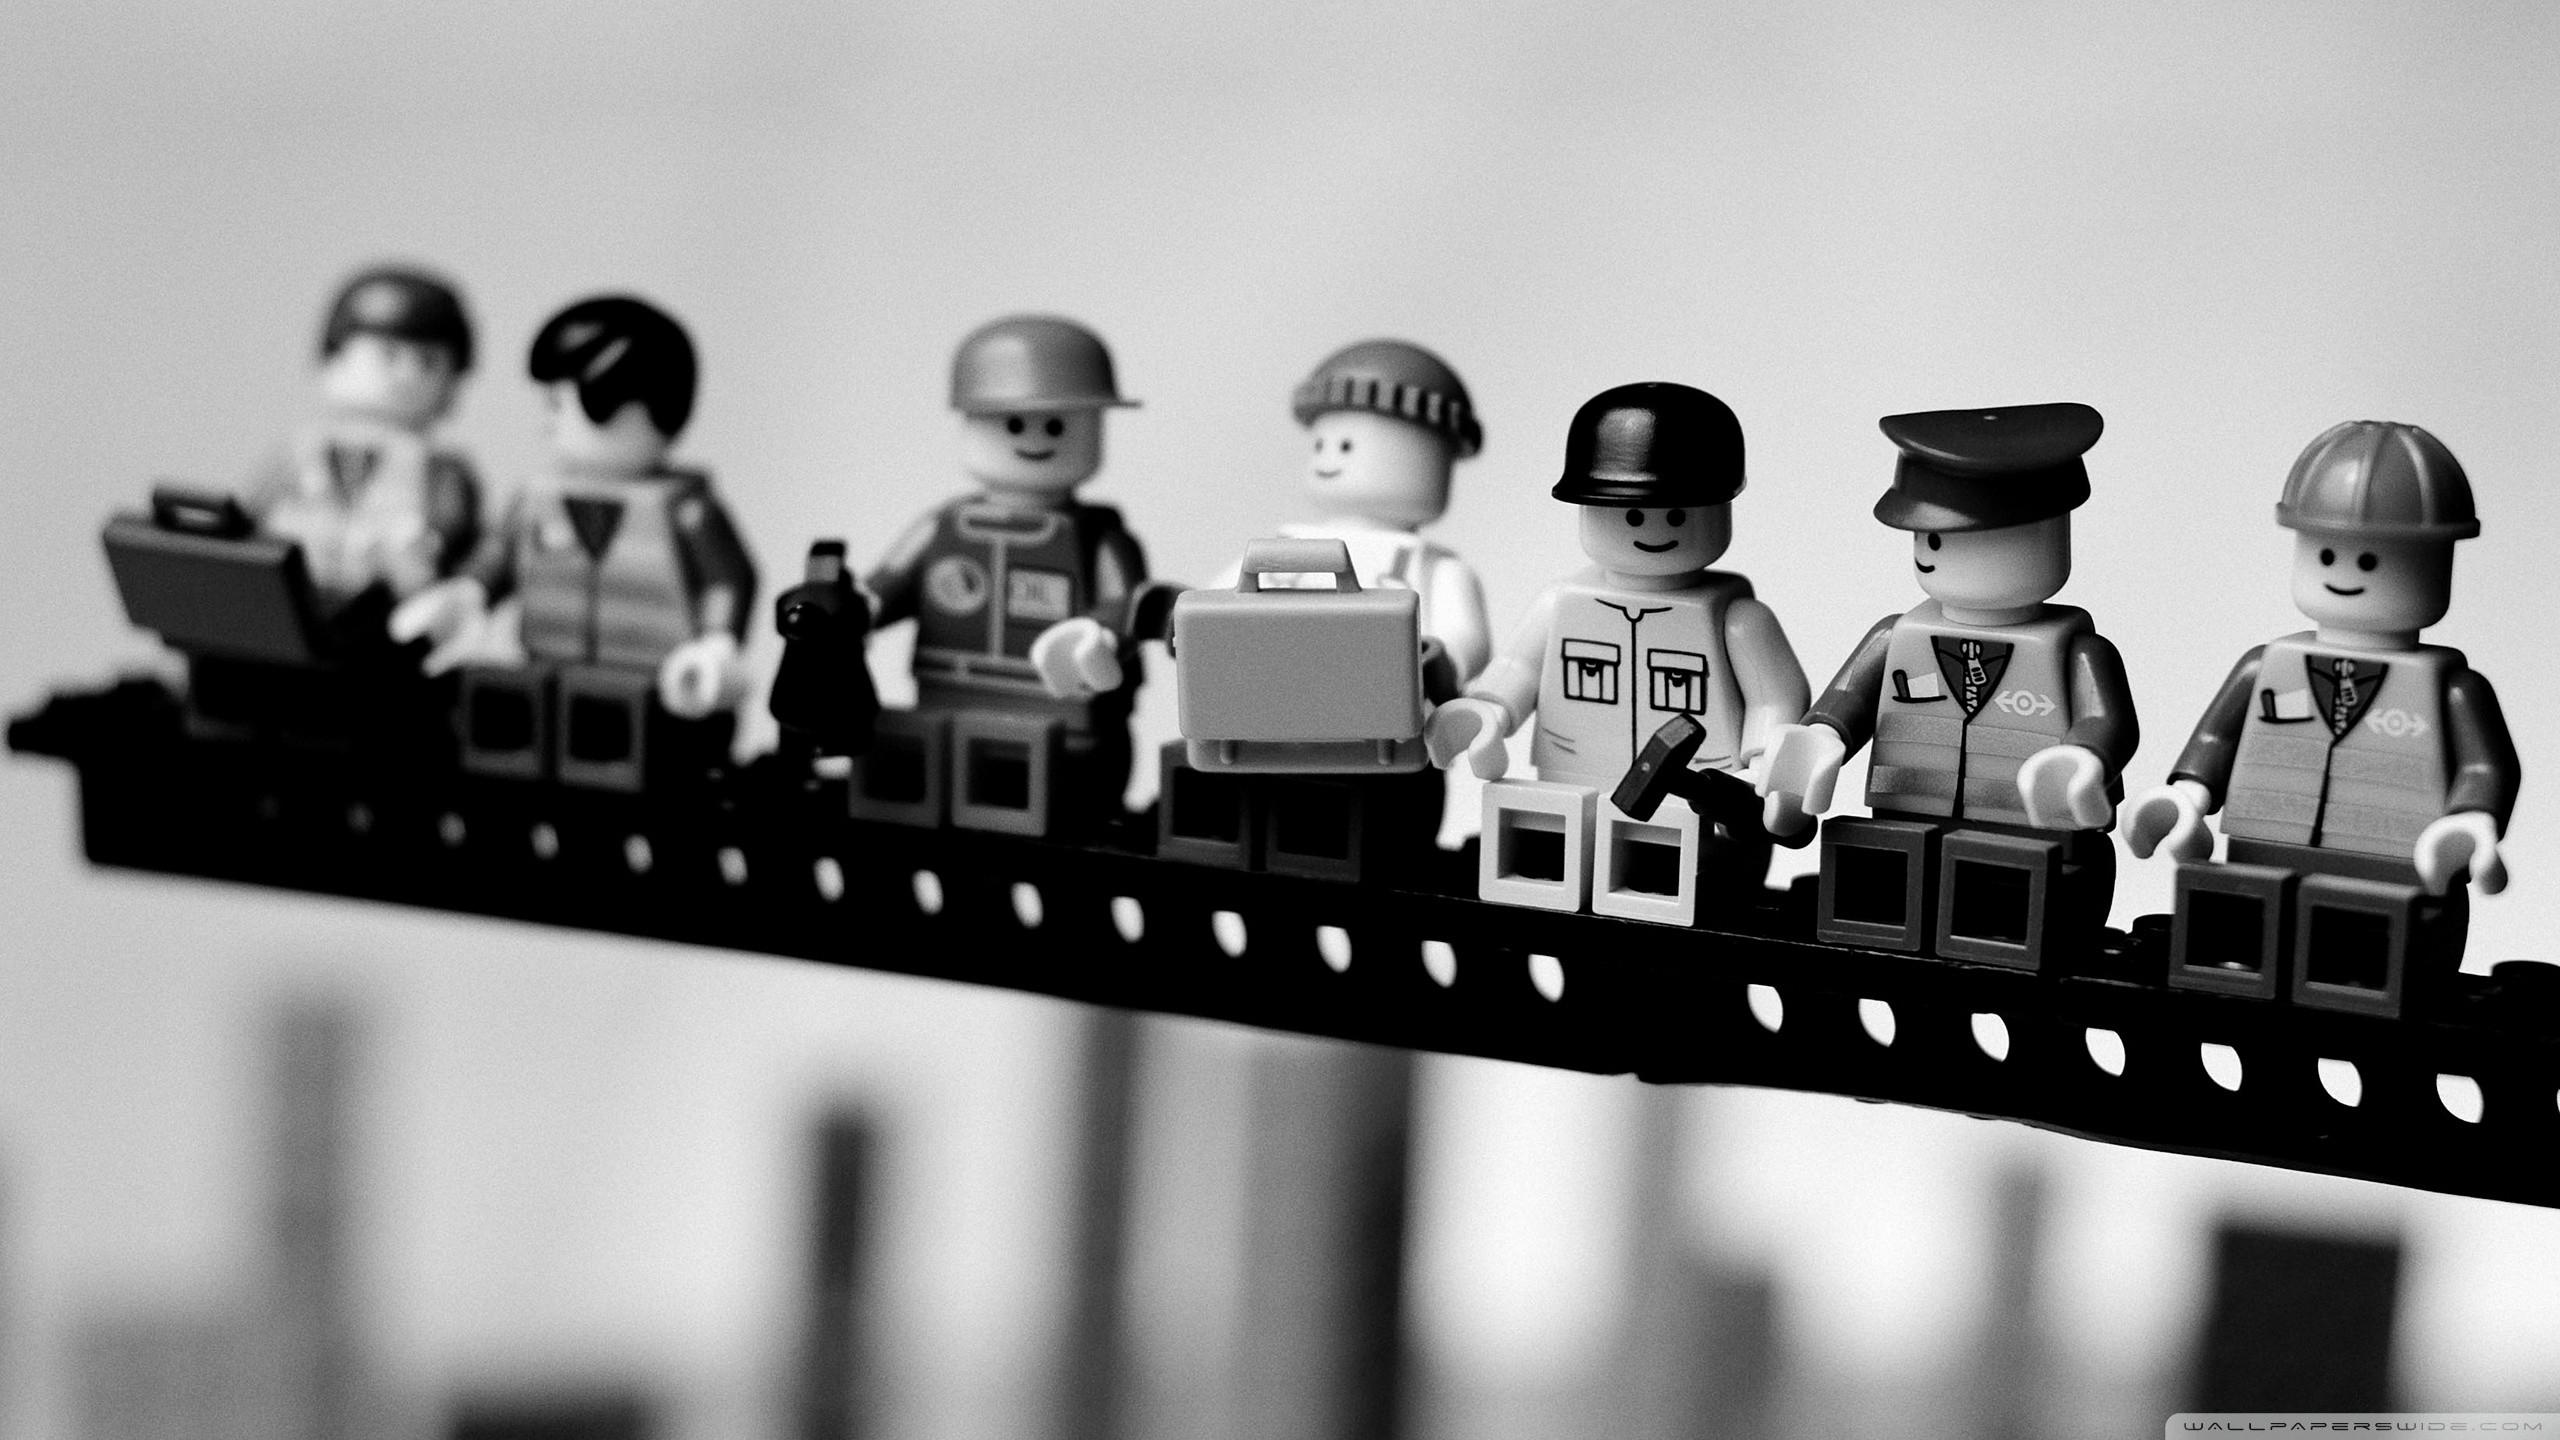 Lego HD desktop wallpaper : High Definition : Fullscreen : Mobile